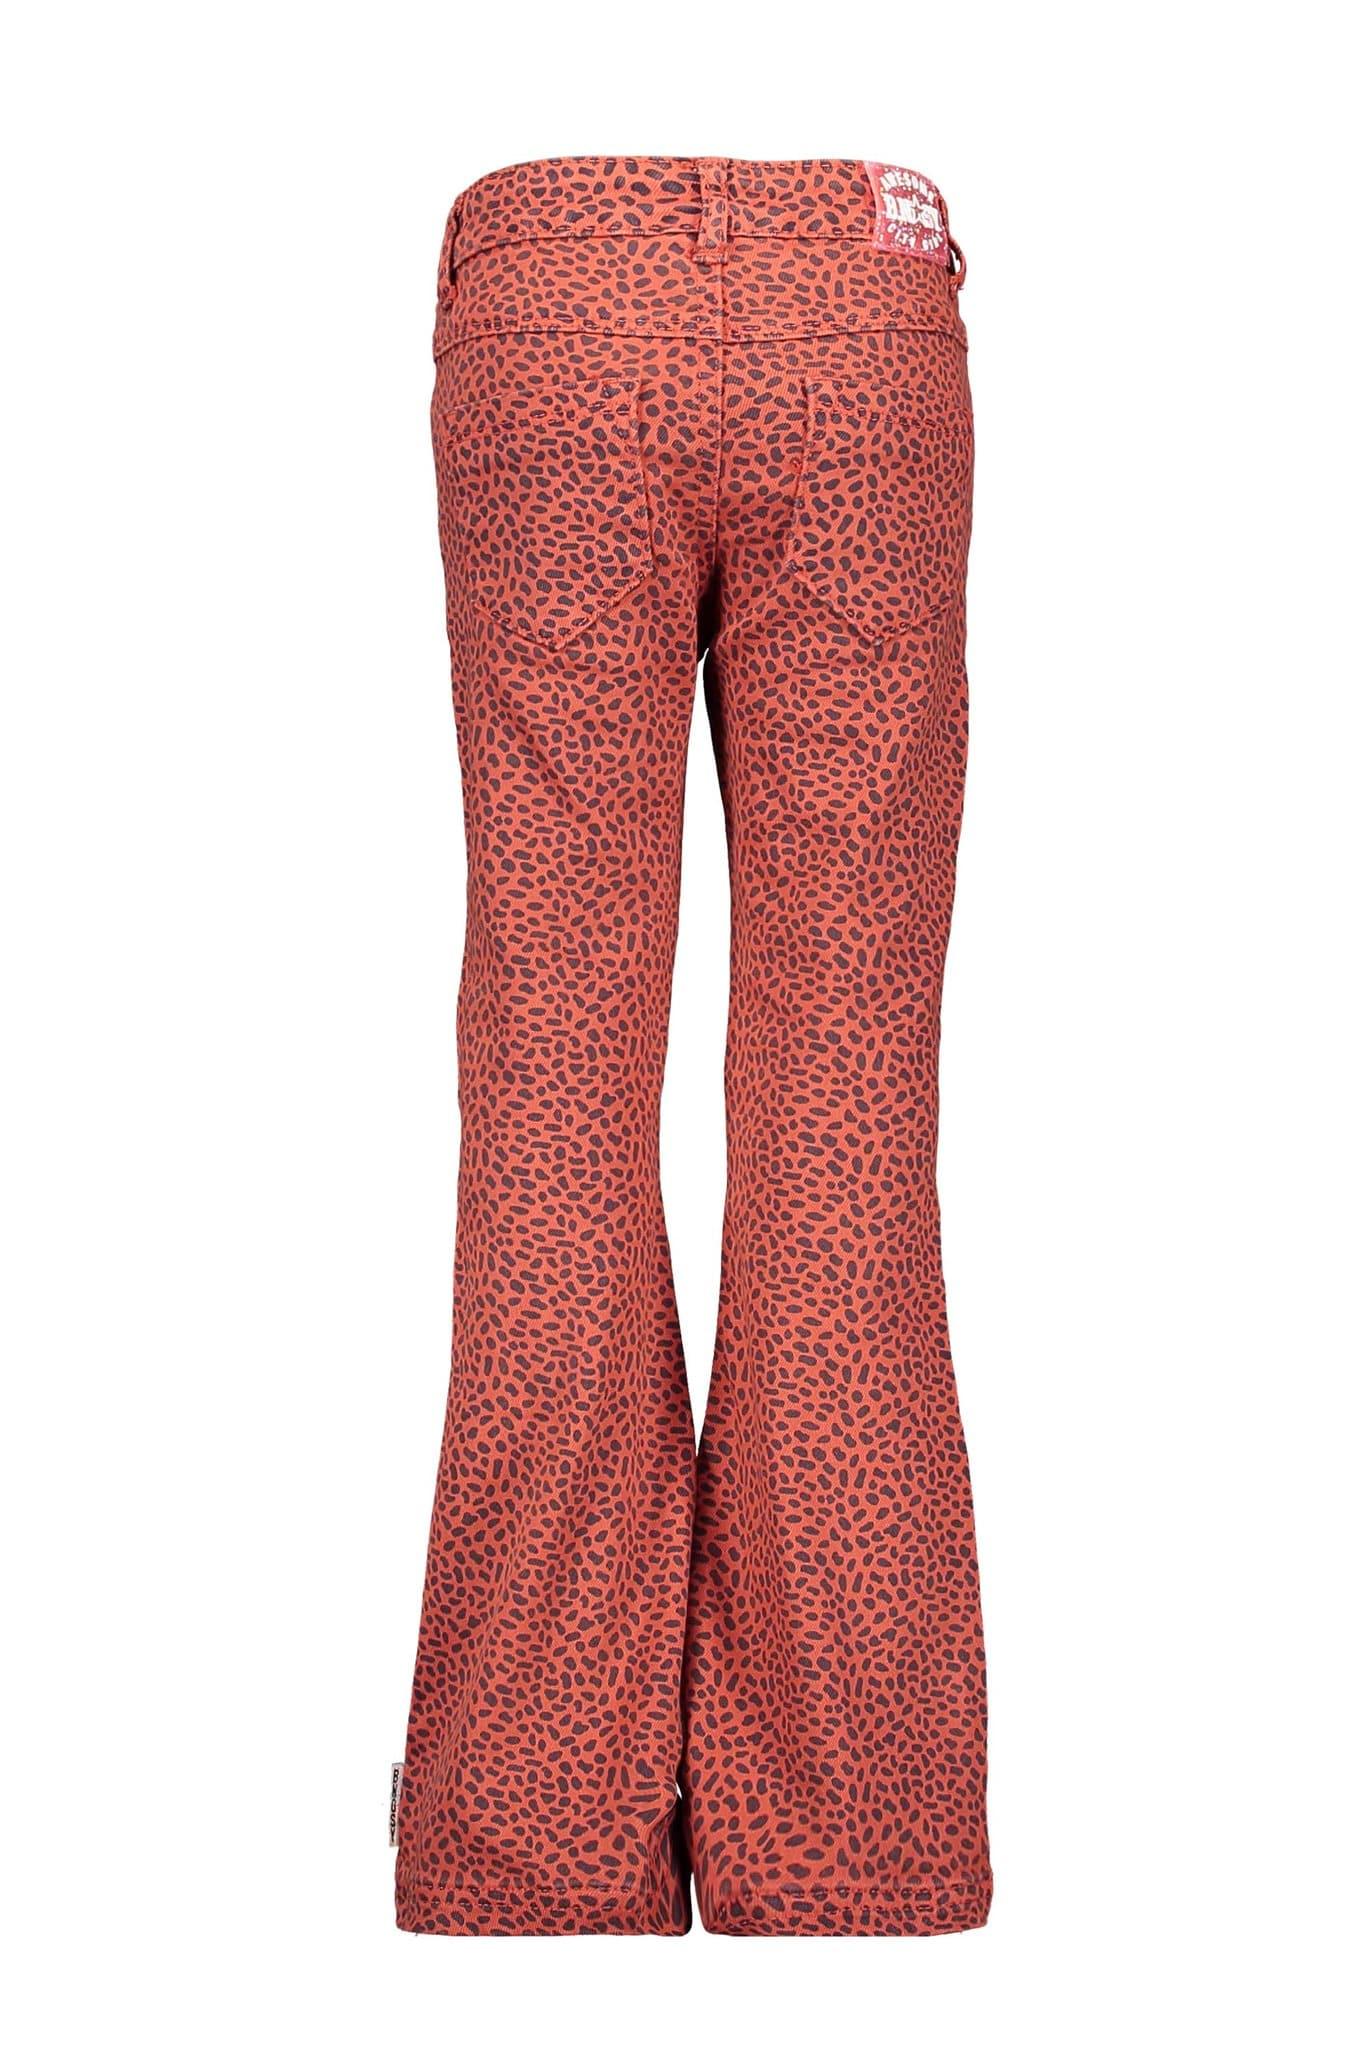 B Nosy Pants Dots